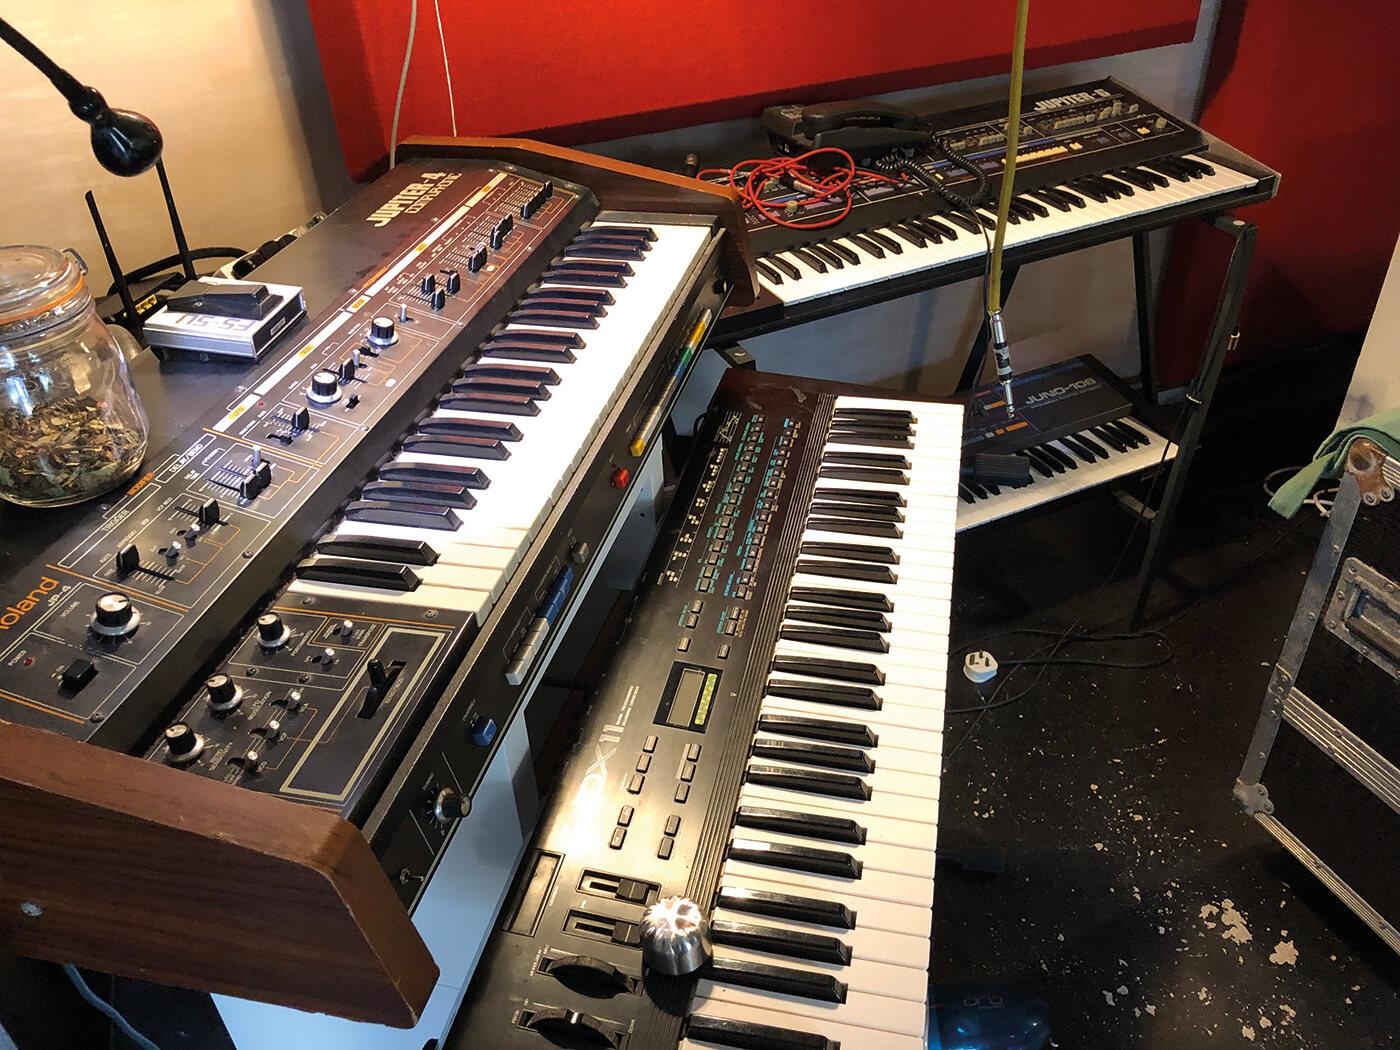 Steve Osborne on blurring genres with Happy Mondays - MusicTech